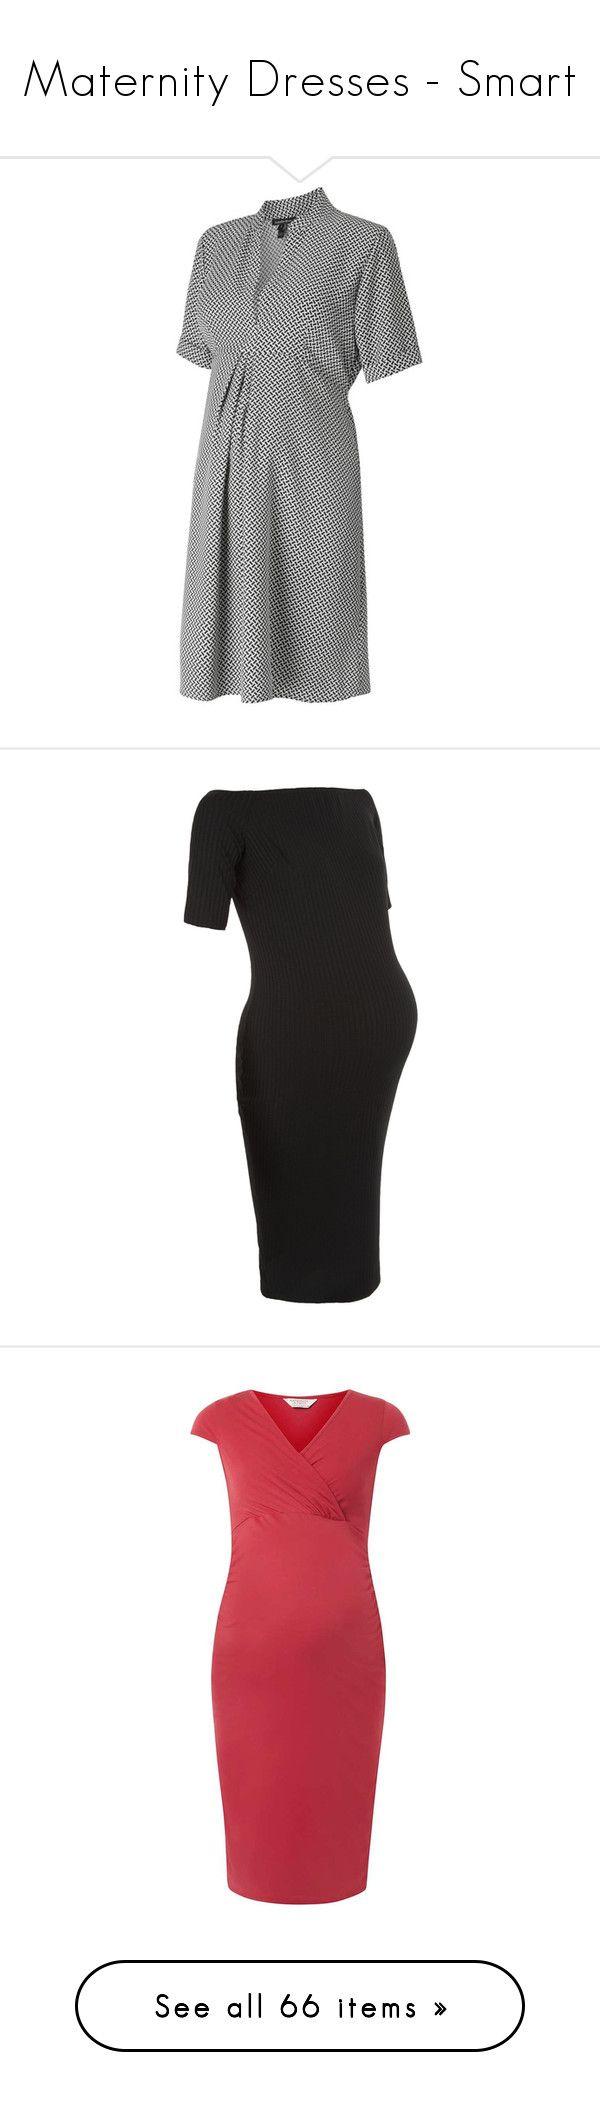 """Maternity Dresses - Smart"" by polkadot-shorts ❤ liked on Polyvore featuring maternity, black, pink, dresses, pregnant, maternity clothes, maternity dresses, maternity dress, powder pink and grávida"